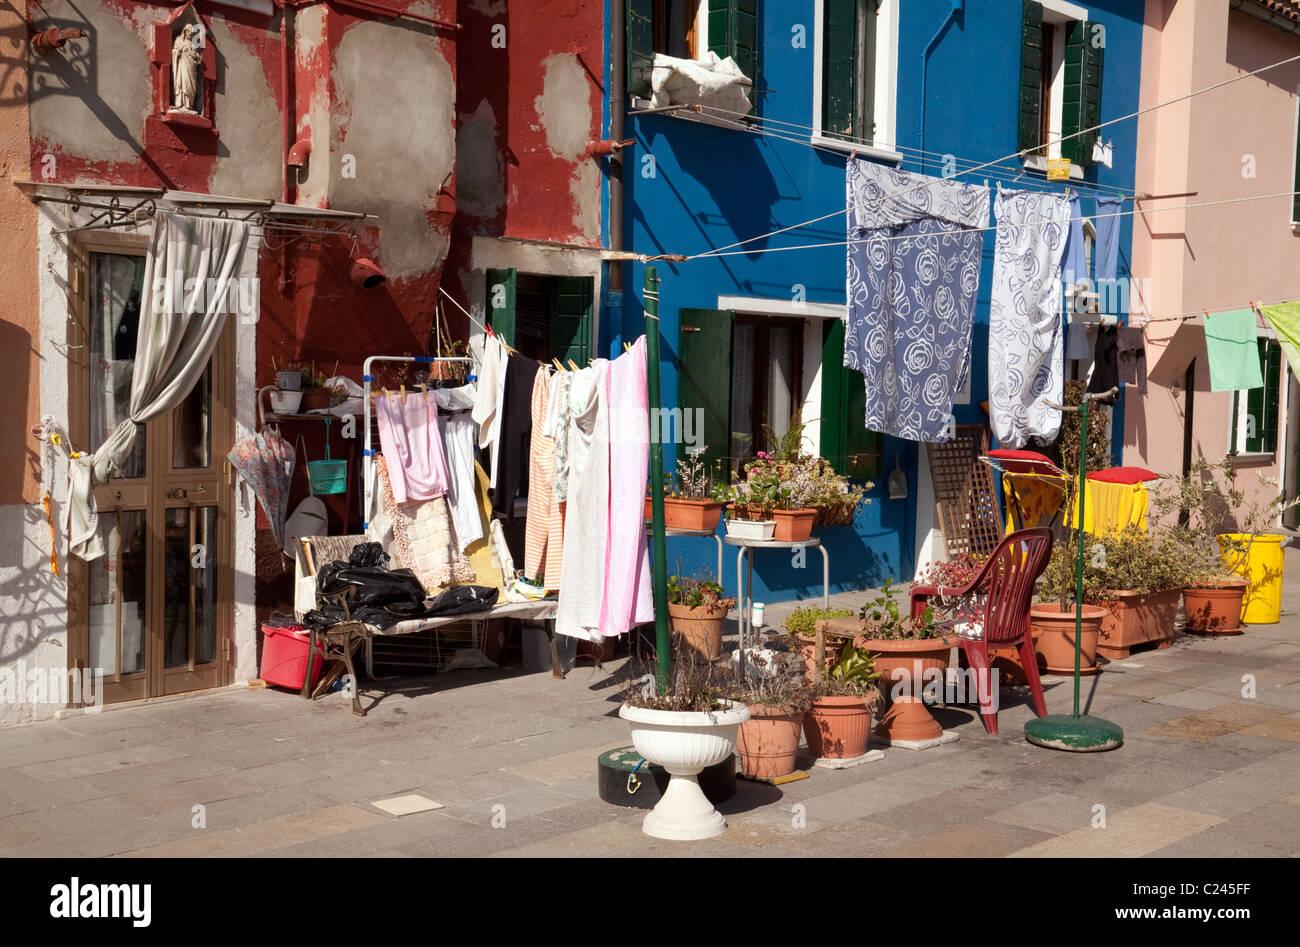 Typical Burano backyard with washing, Burano village, Venice, Italy - Stock Image